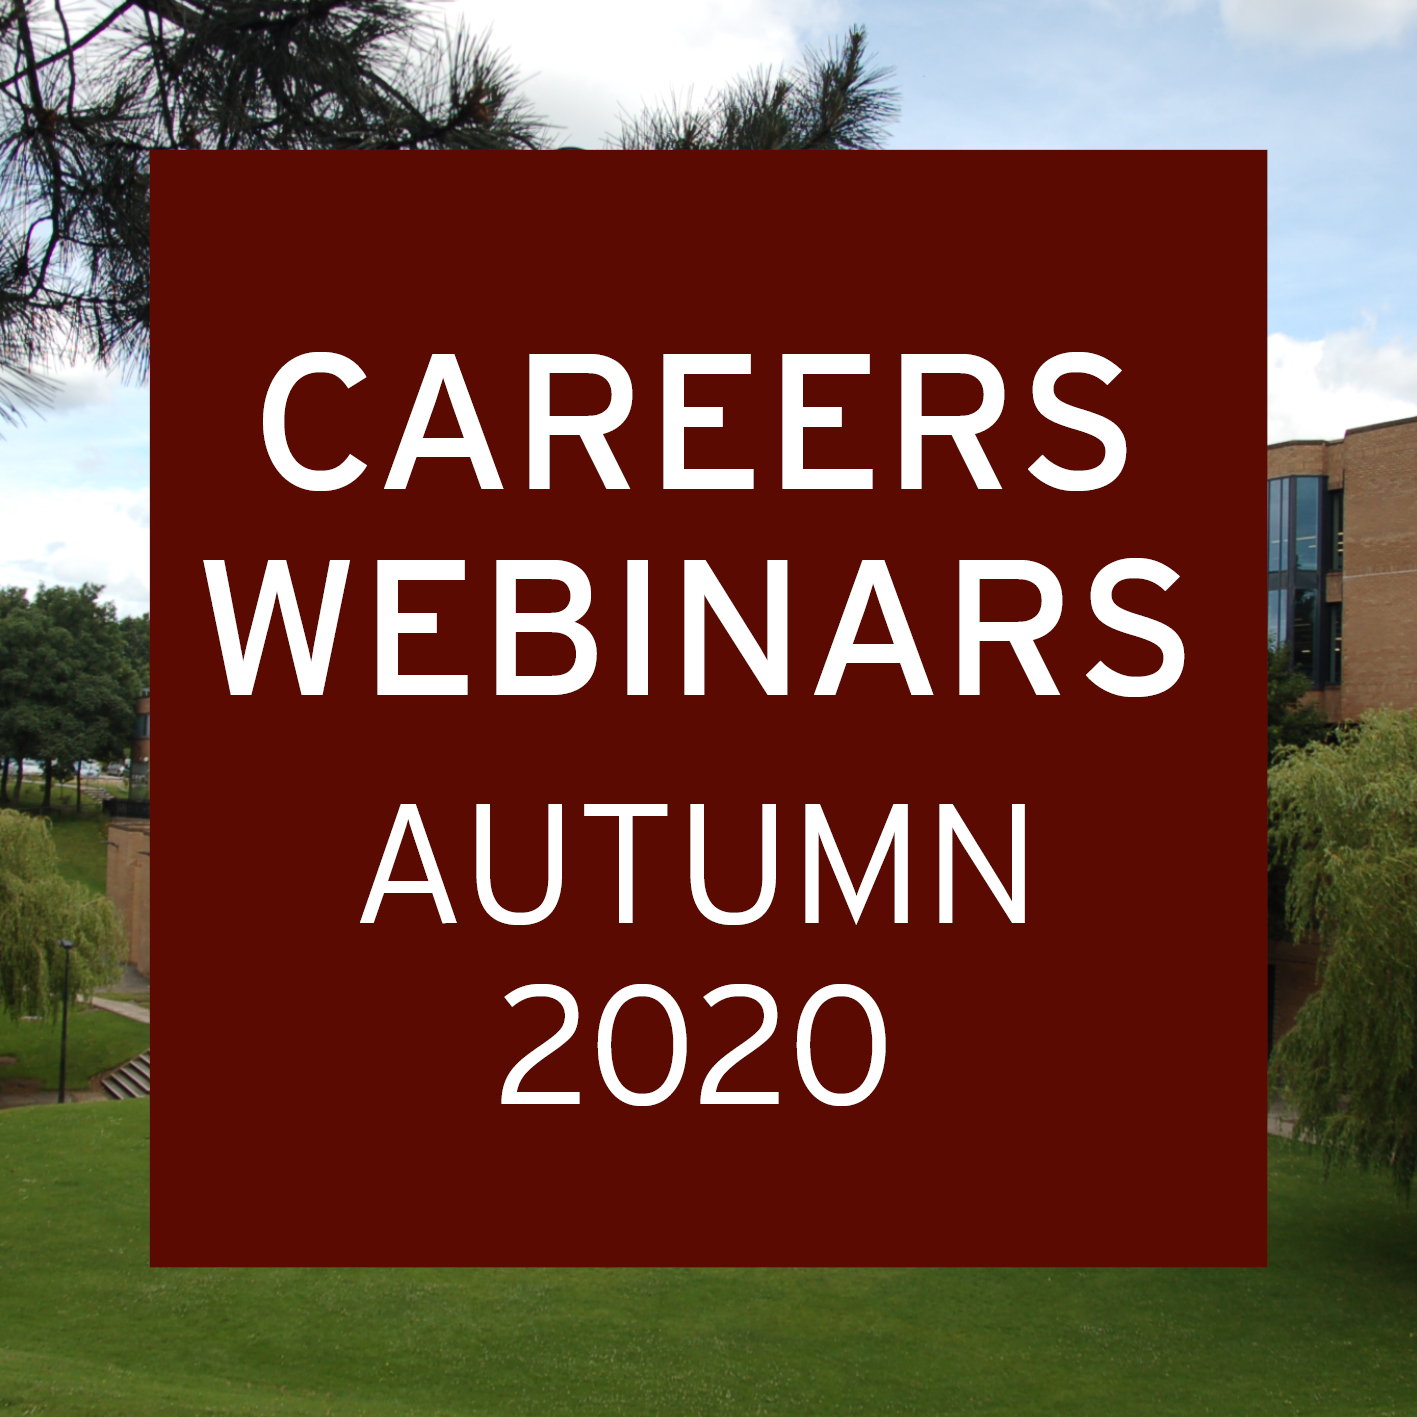 Careers Webinars Autumn 2020 logo